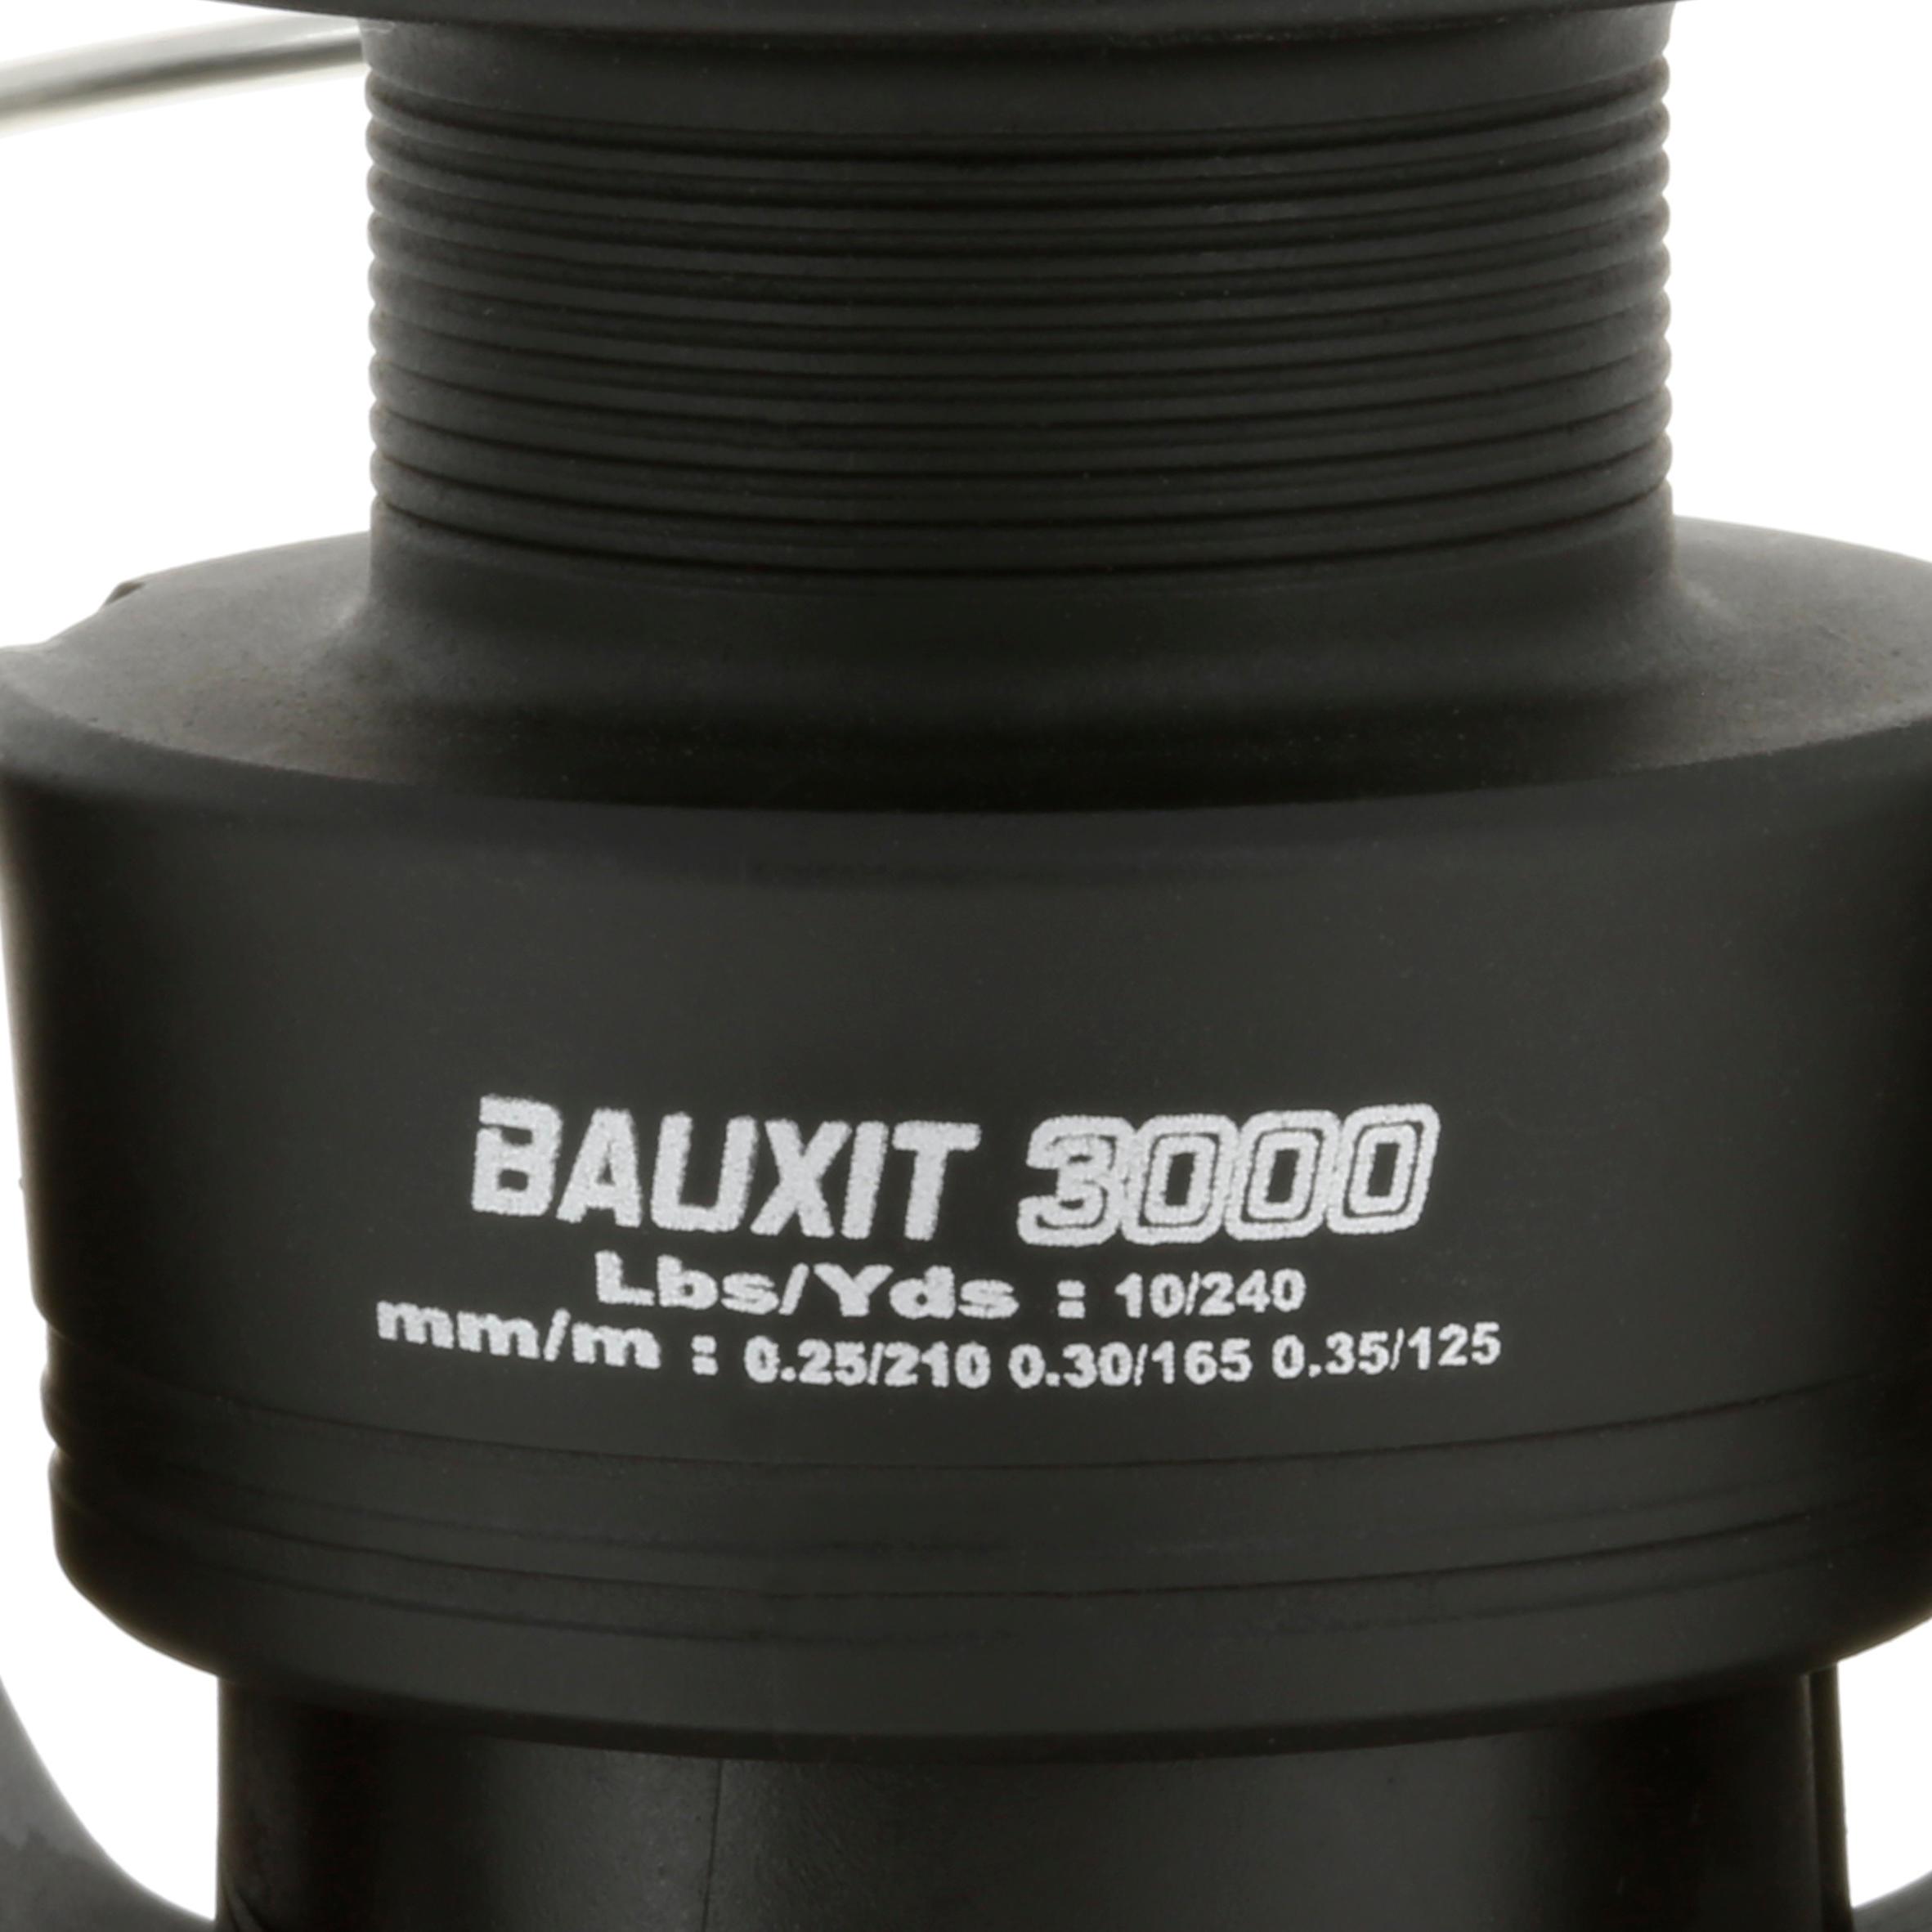 BAUXIT 3000 light fishing reel